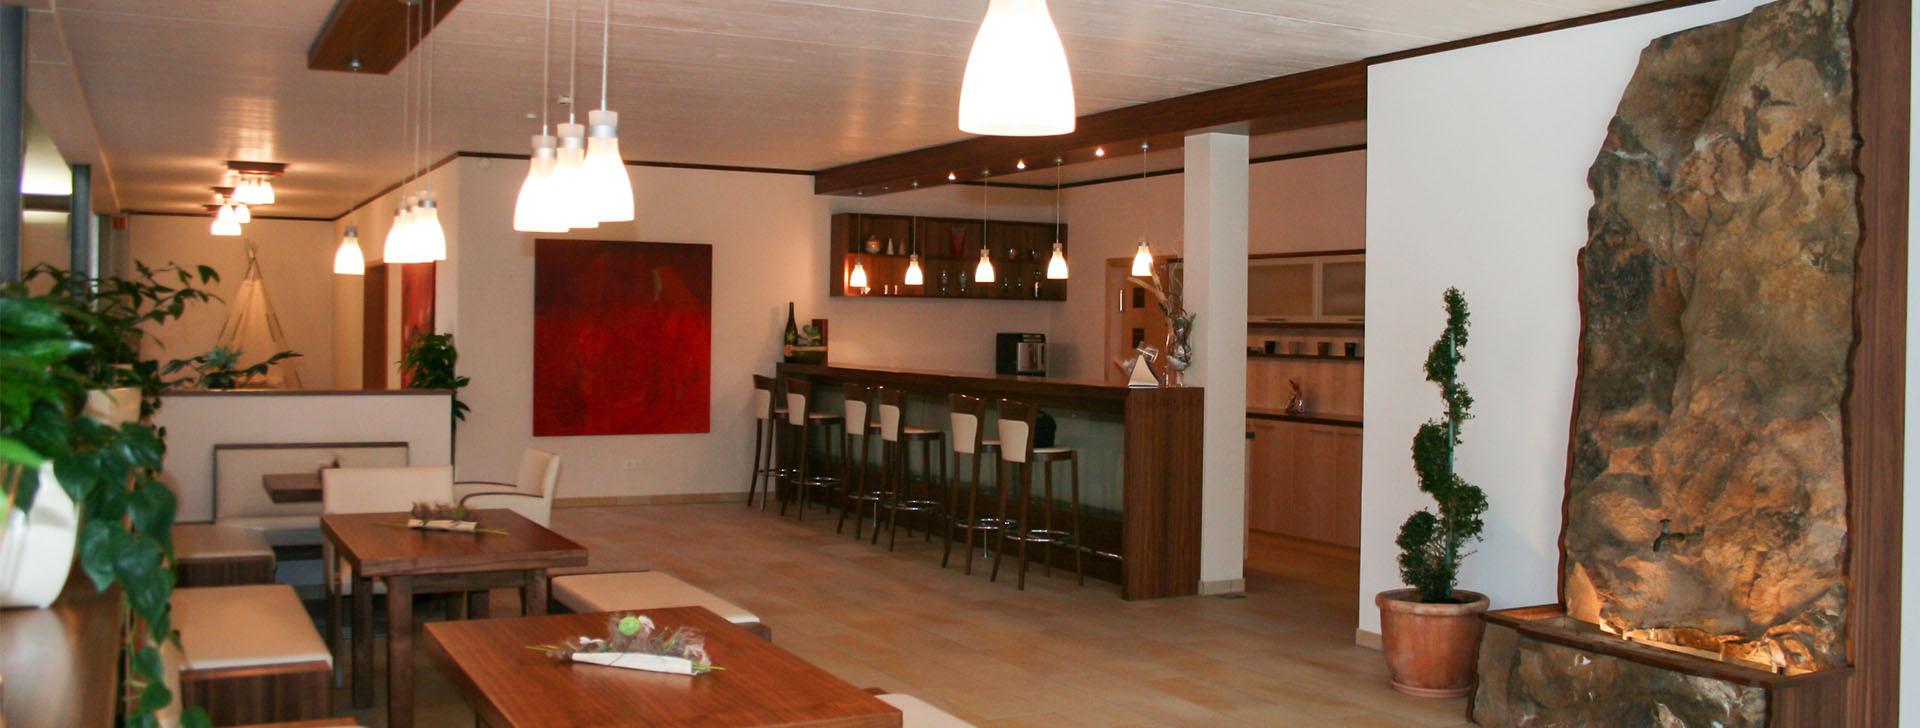 wolfs bauherrenstudio in osterhofen. Black Bedroom Furniture Sets. Home Design Ideas